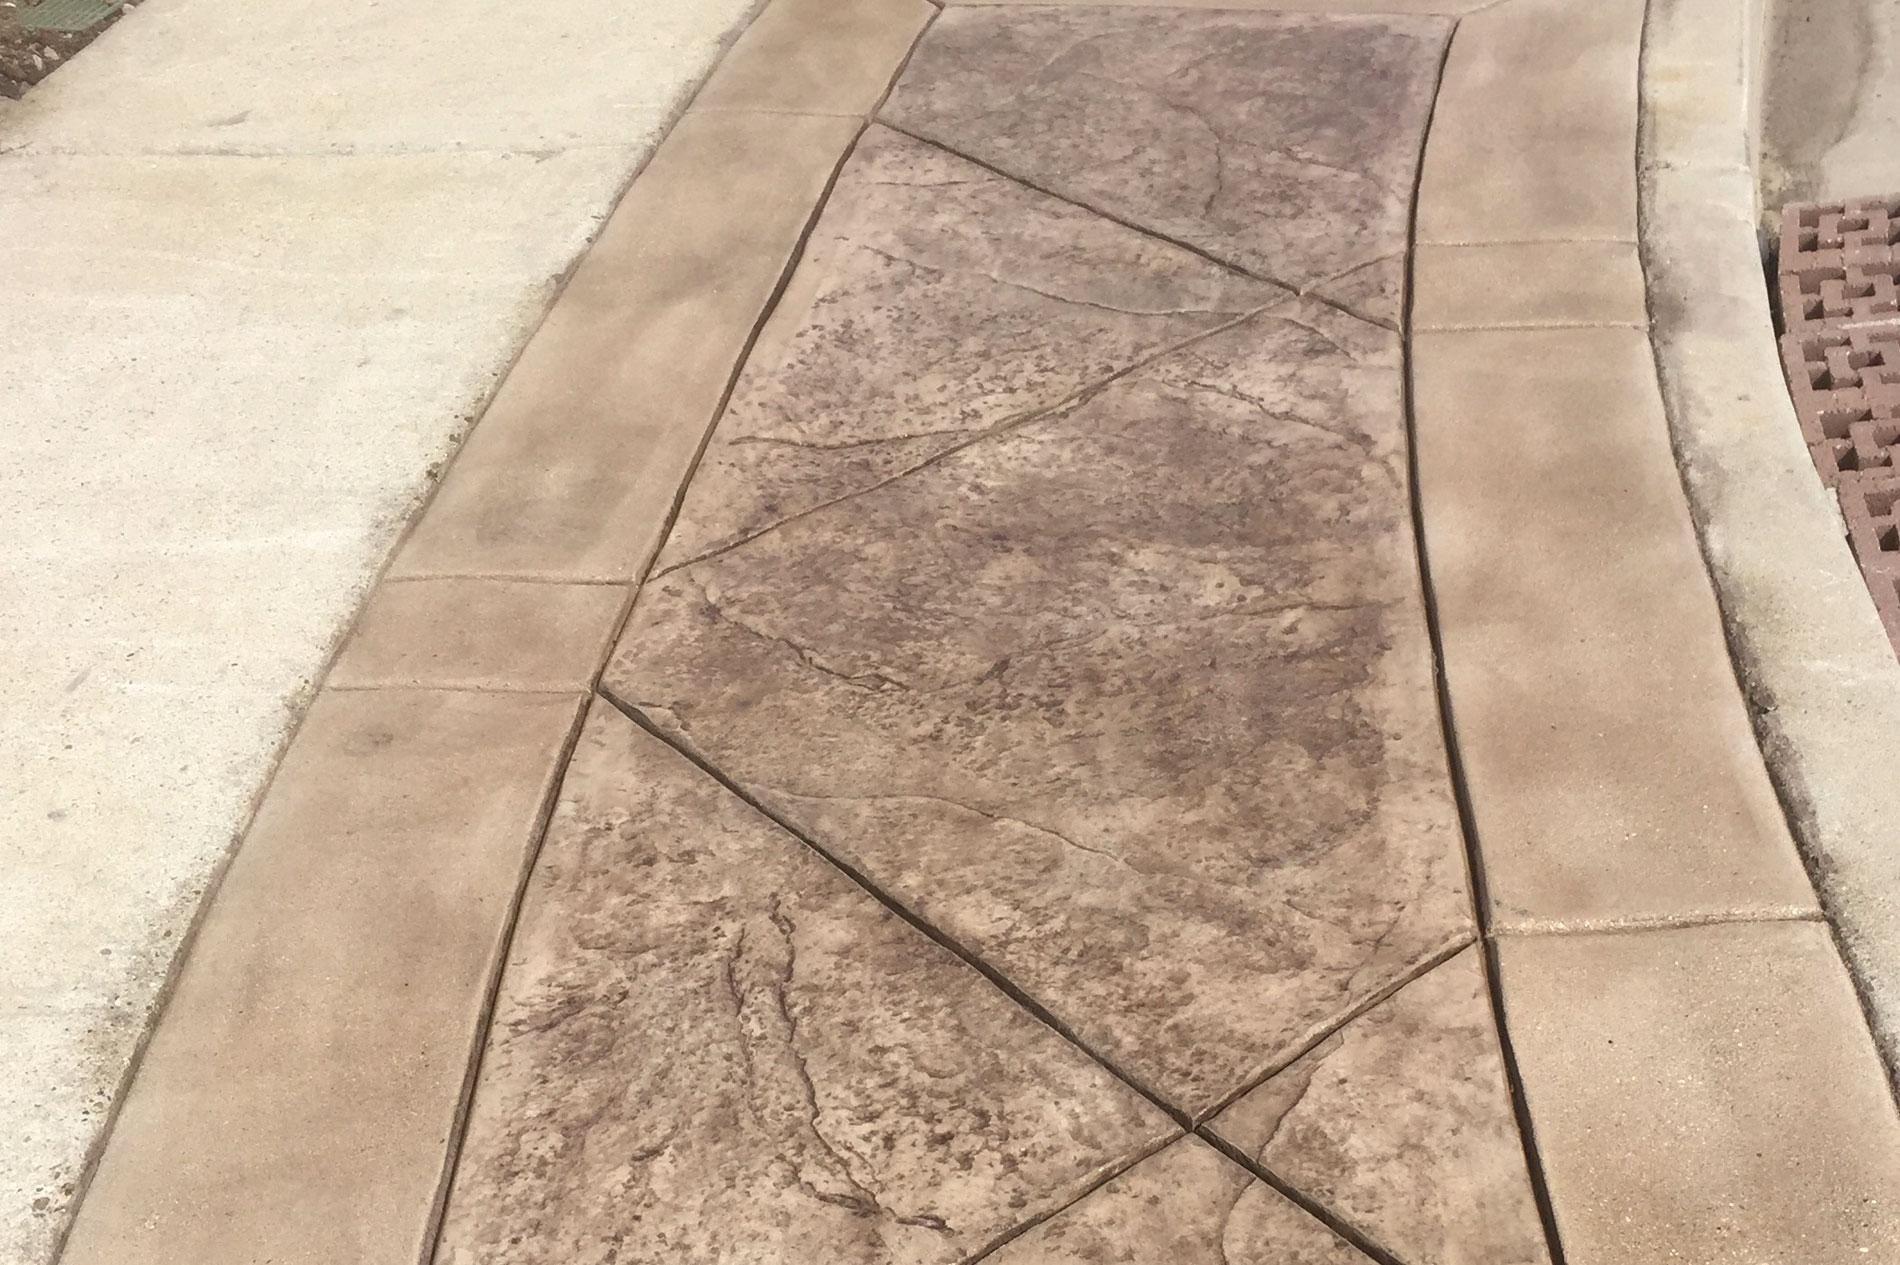 Stamped Concrete Walkway Progress Shot